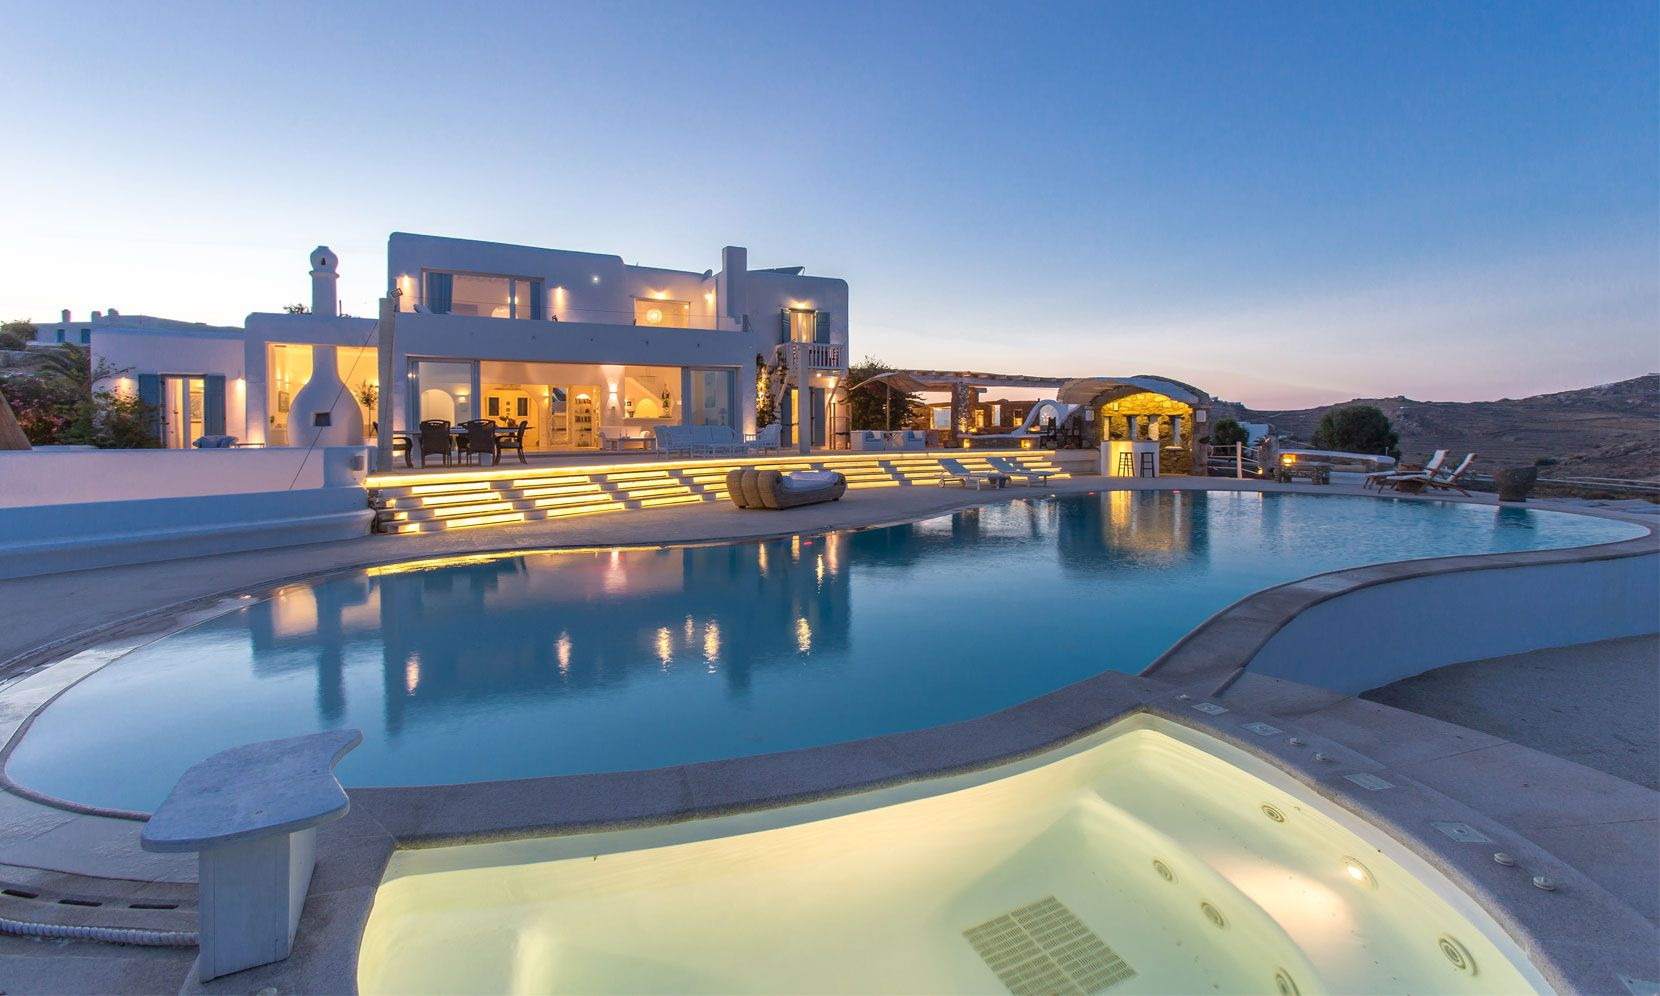 Mykonos Luxury Villa Hermes jumbotron image